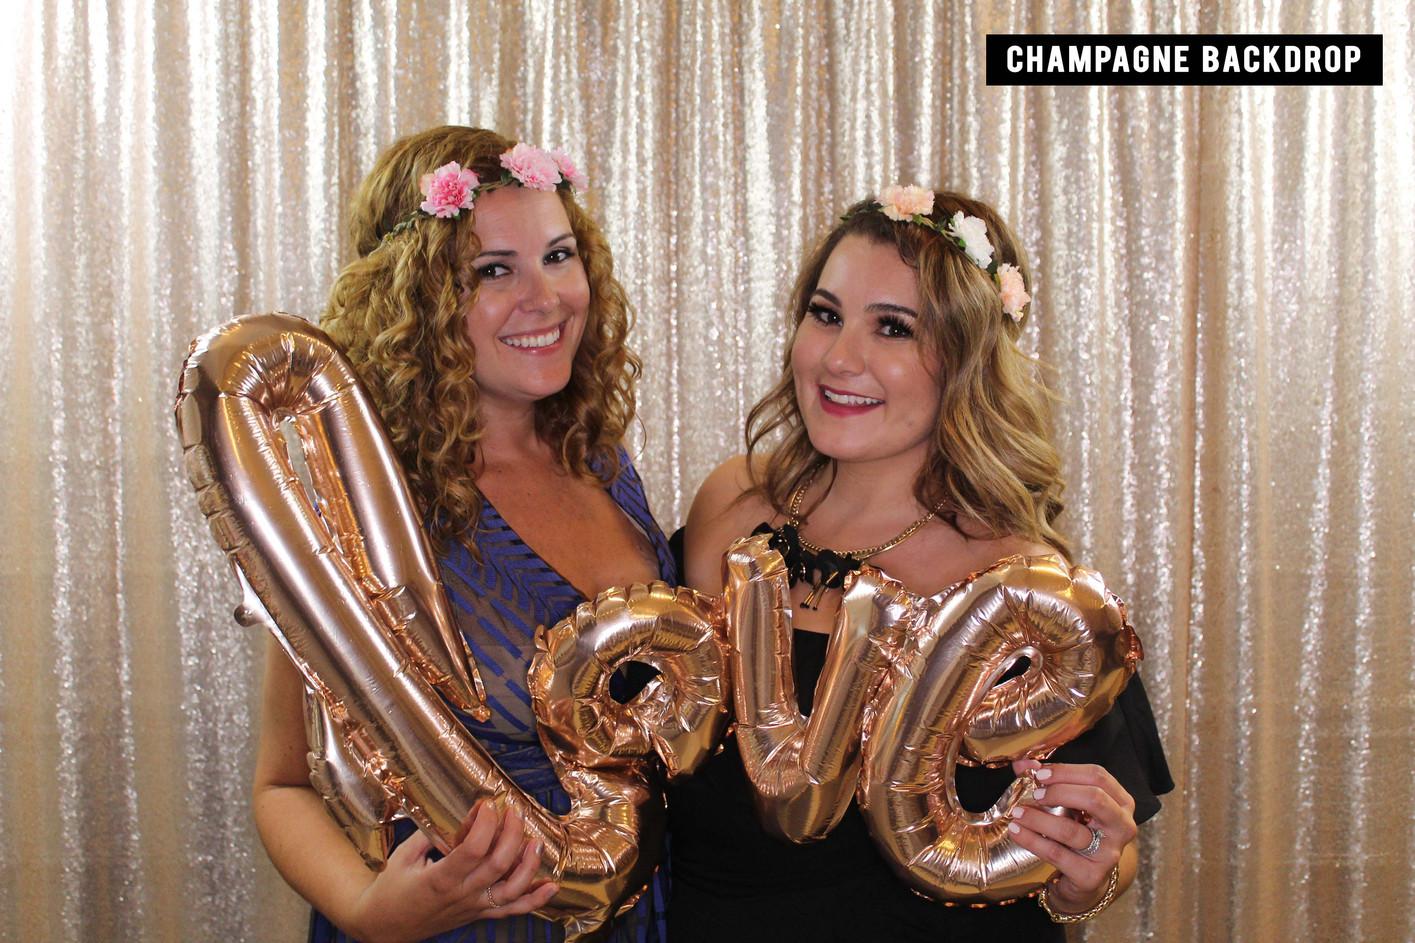 Champagne Backdrop Sample Photo.JPG.jpg